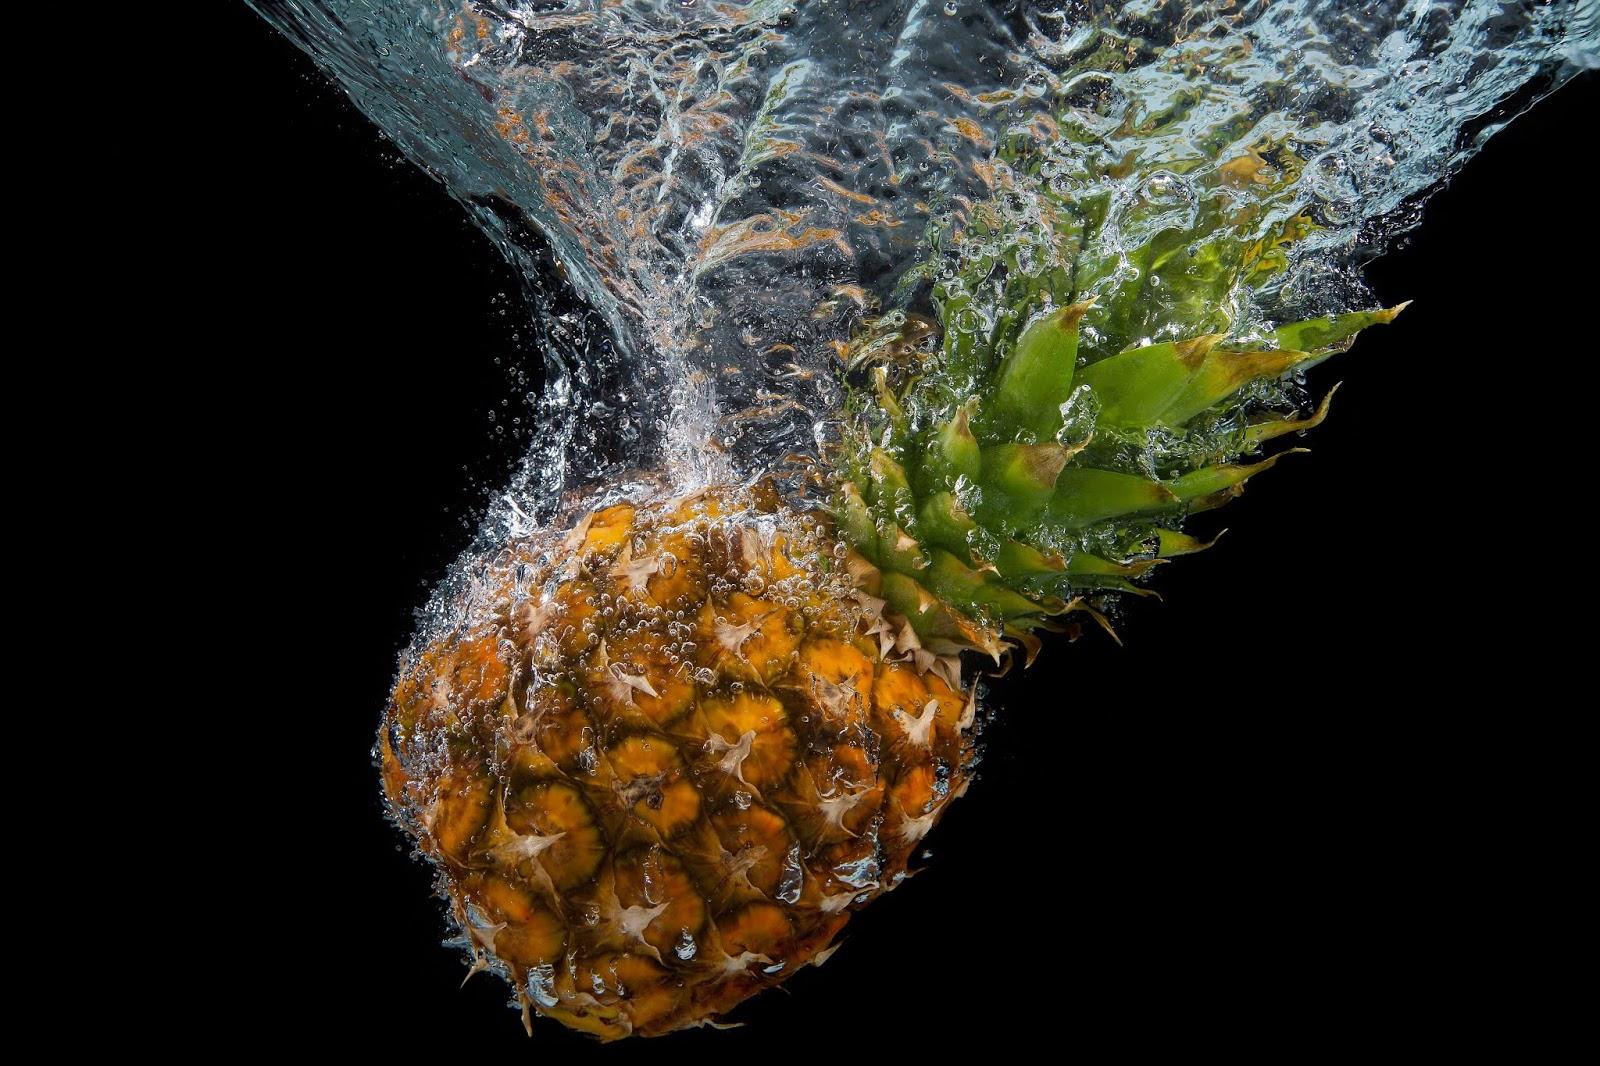 अनानस रस के 10 अद्भुत स्वास्थ्य लाभ   10 Amazing Health Benefits Of Pineapple Juice in Hindi